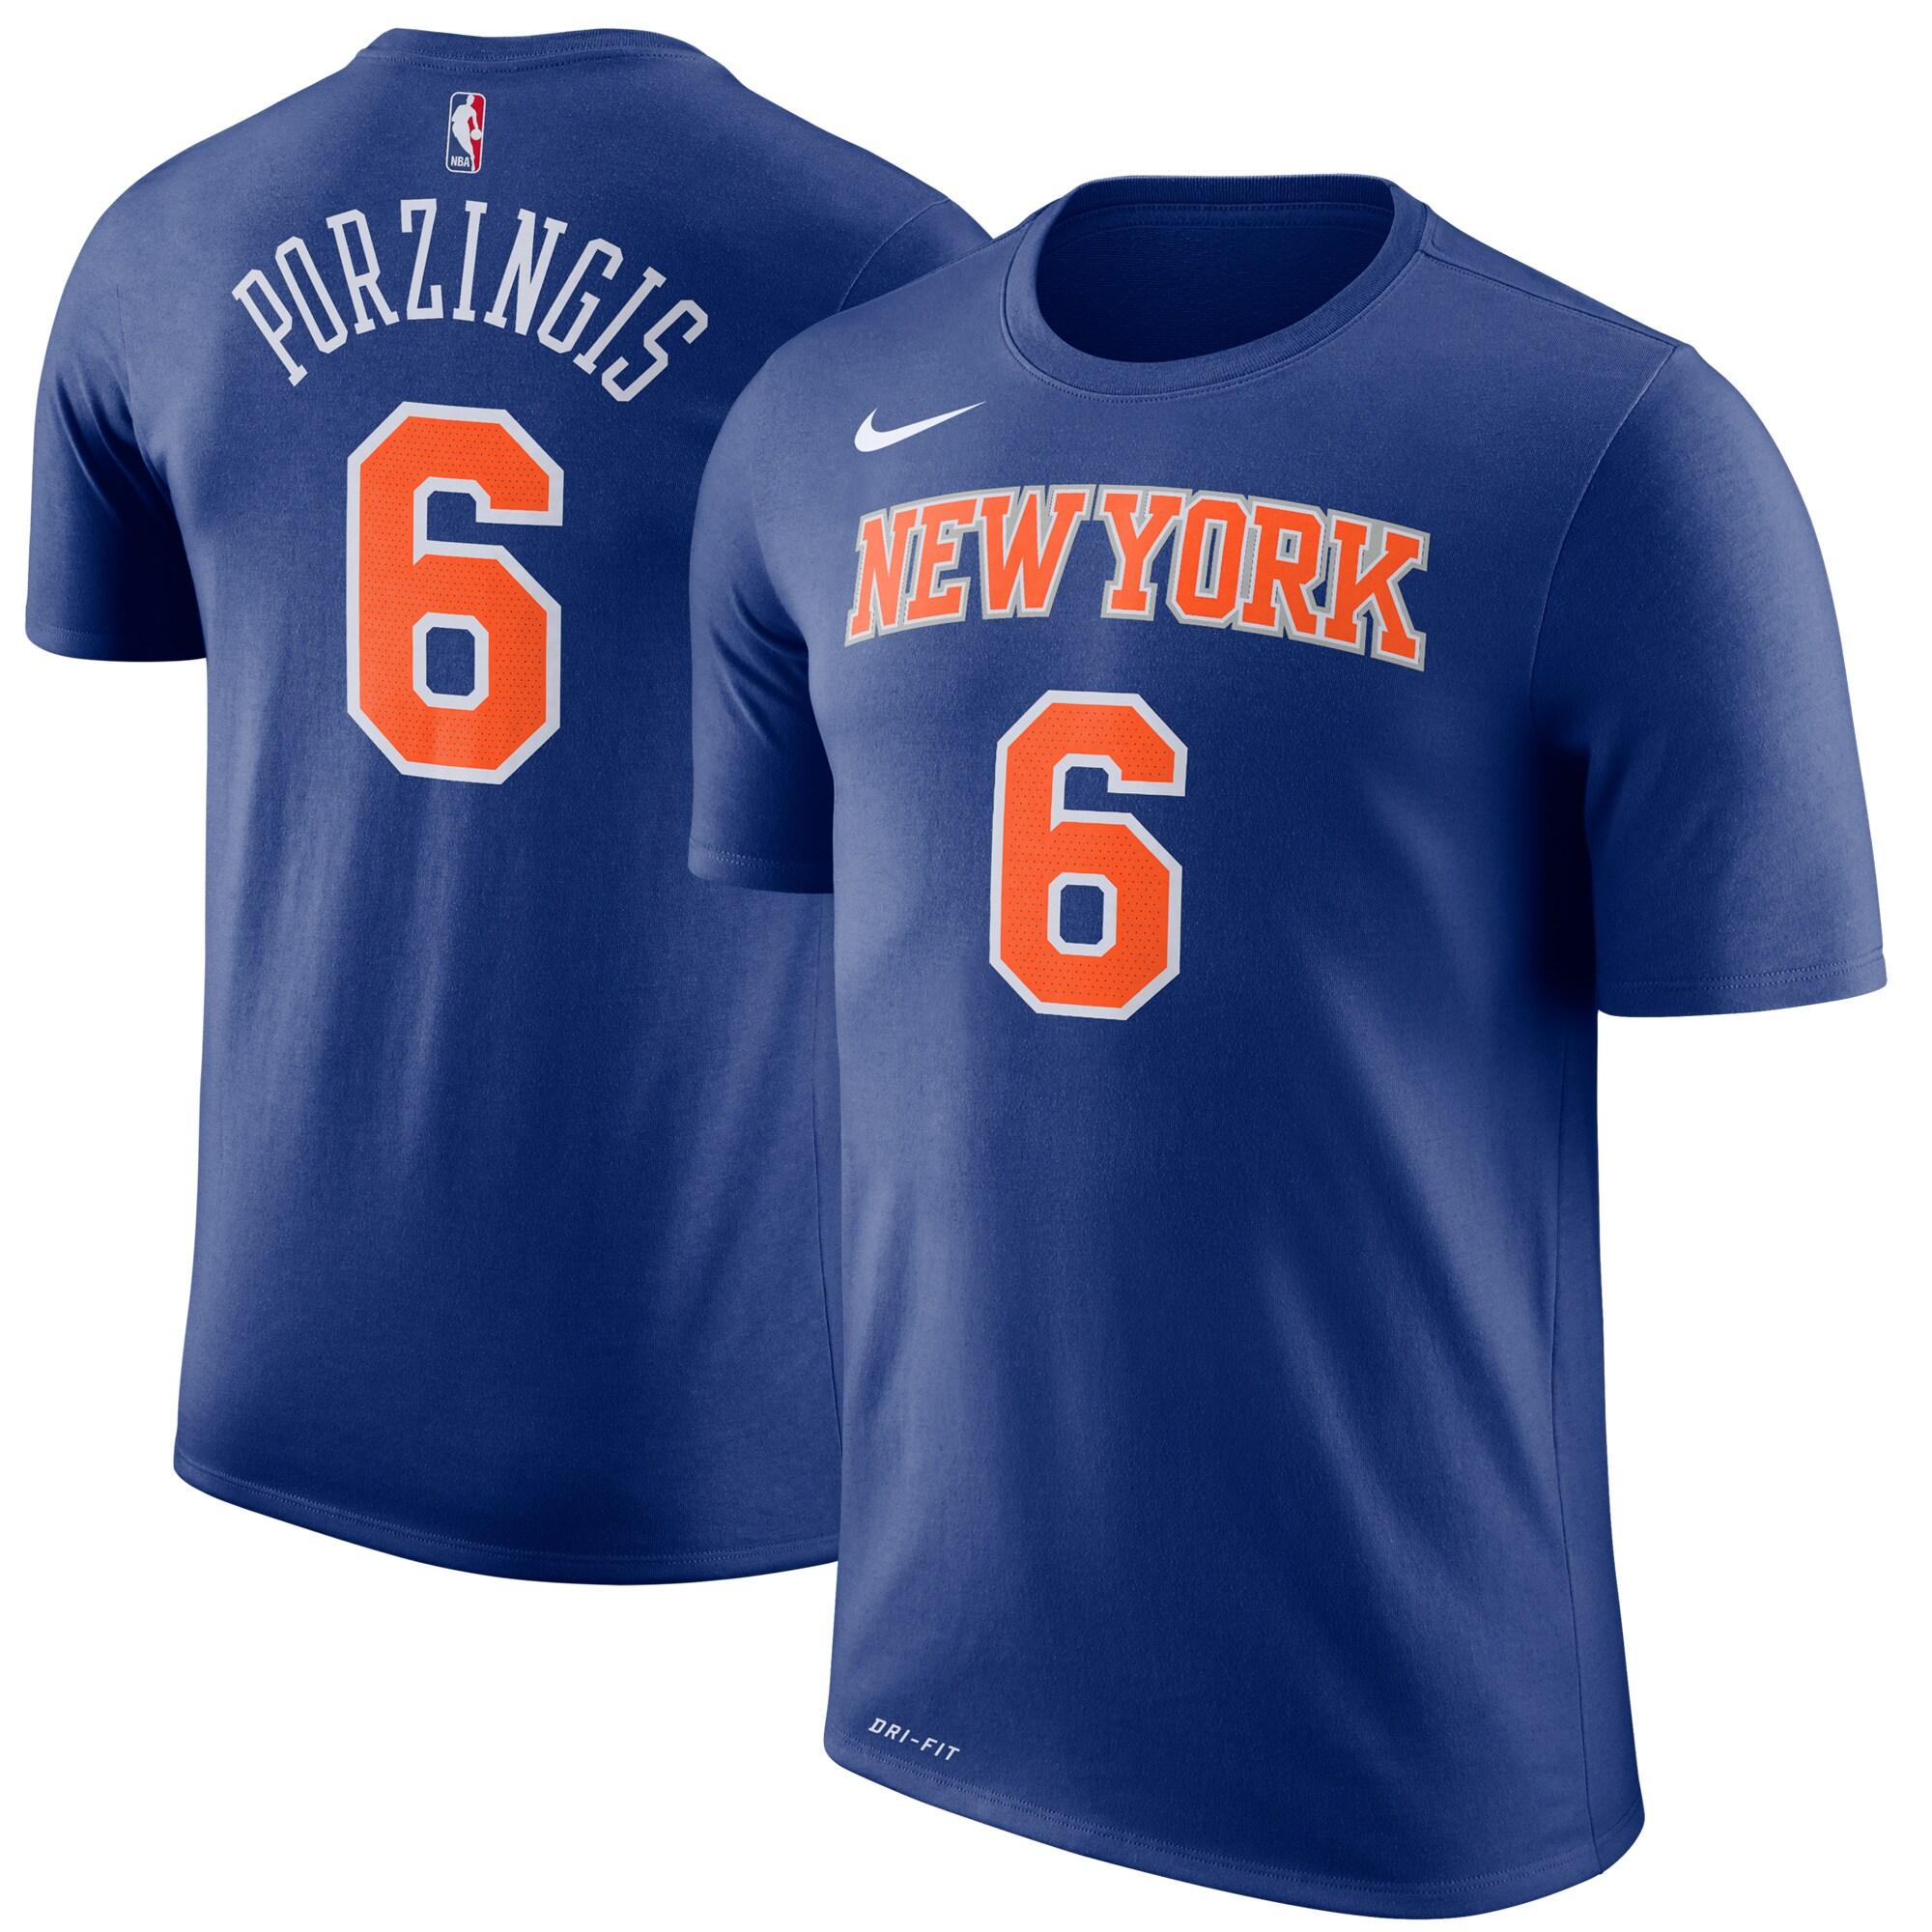 Kristaps Porzingis New York Knicks Nike Youth Name & Number T-Shirt - Blue